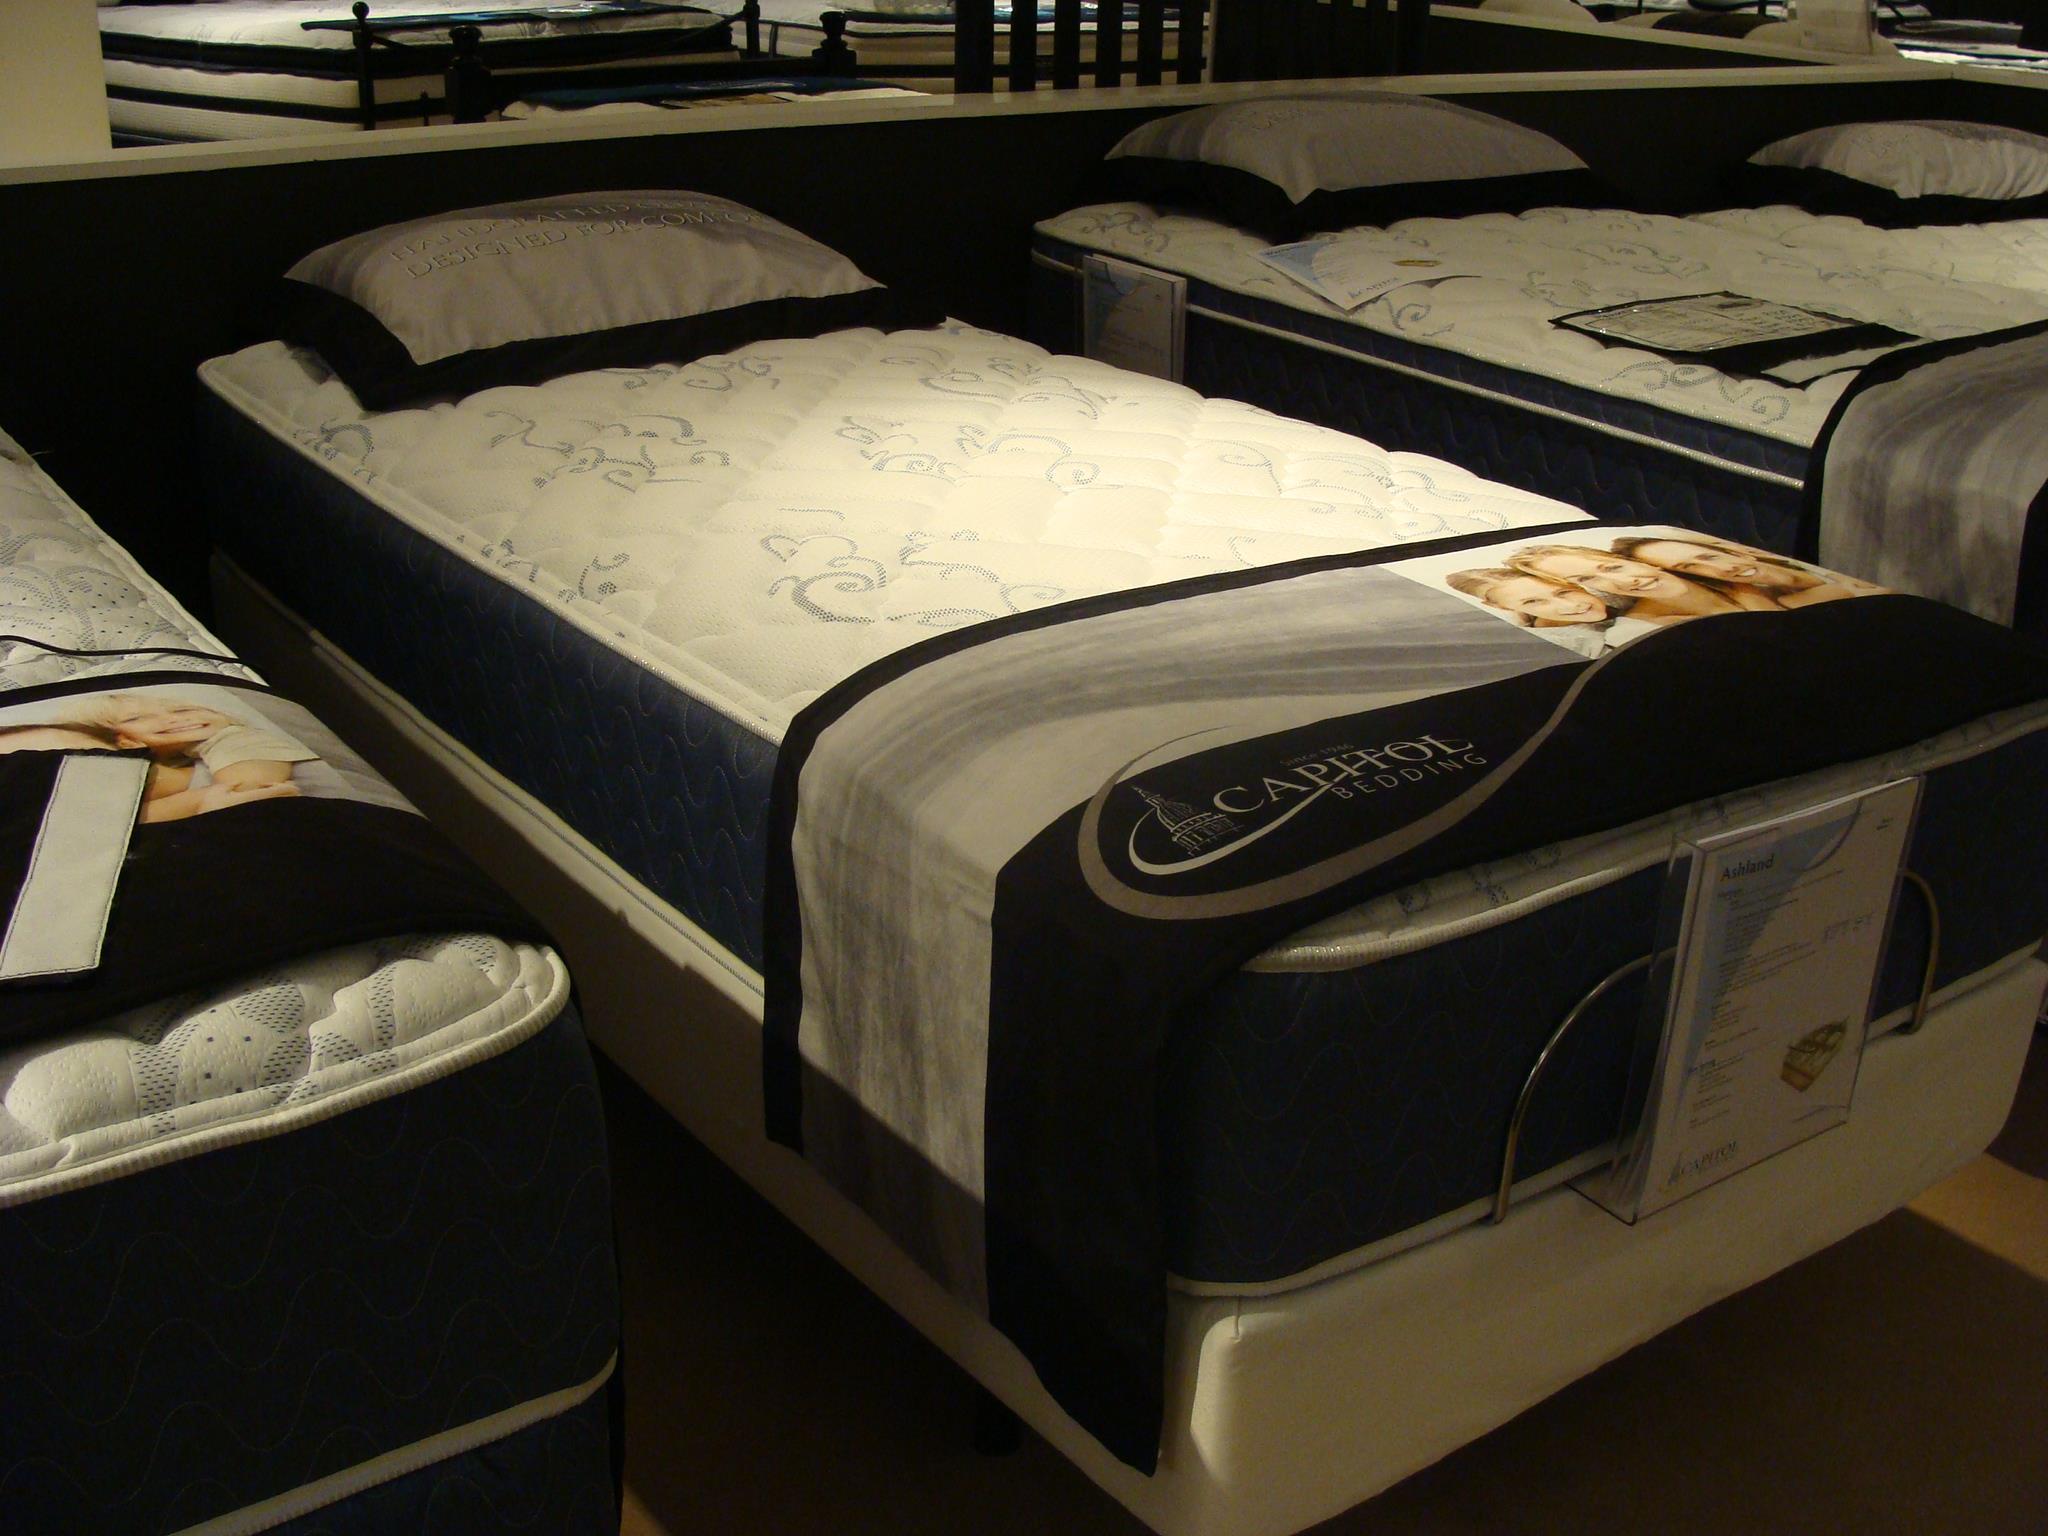 Capitol Bedding Ashland Queen Mattress Only - Item Number: VertiCoil-Q